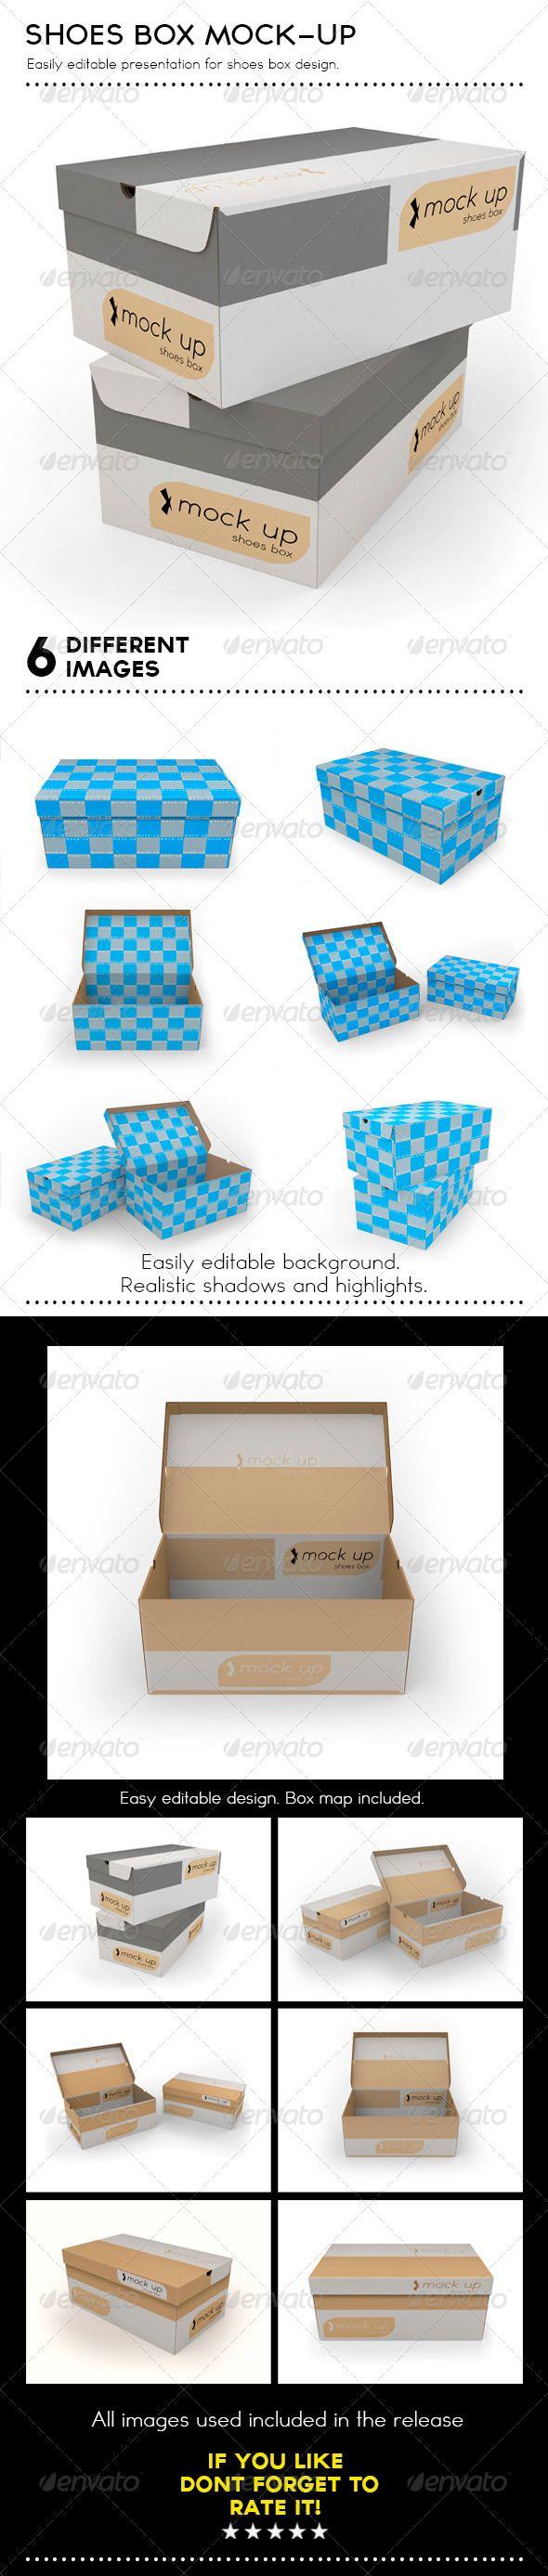 Shoes Box Mockup